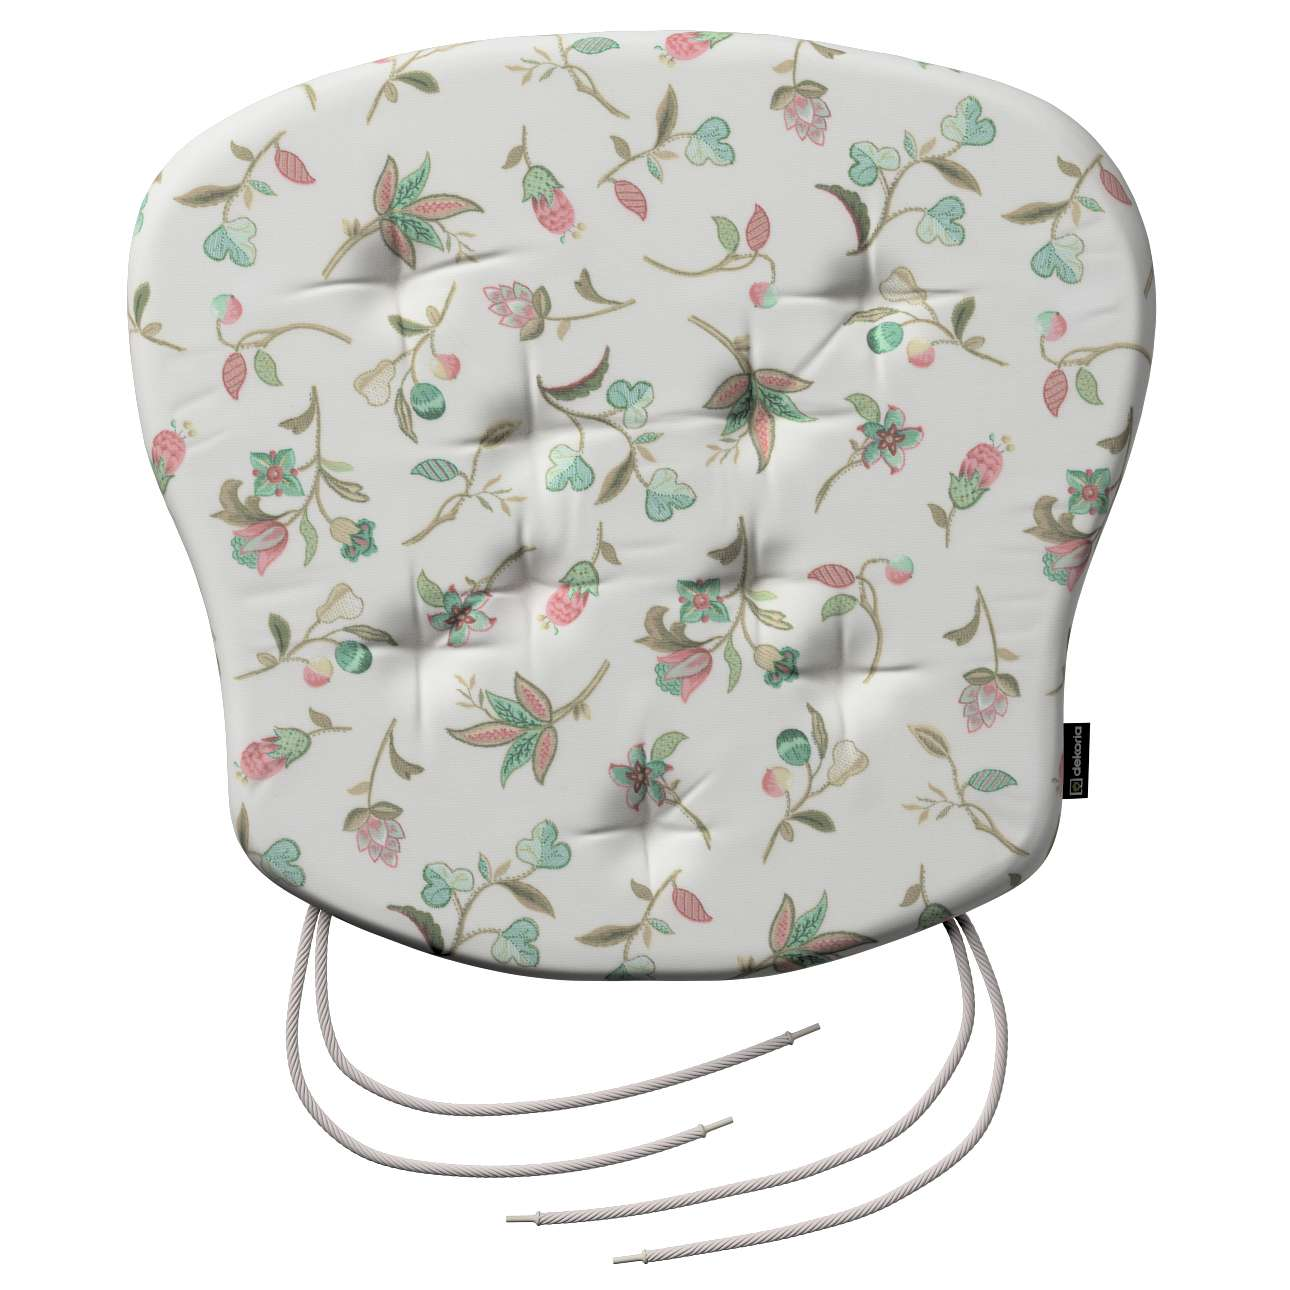 Kėdės pagalvėlė Filip  41 x 38 x 3,5 cm kolekcijoje Londres, audinys: 122-02